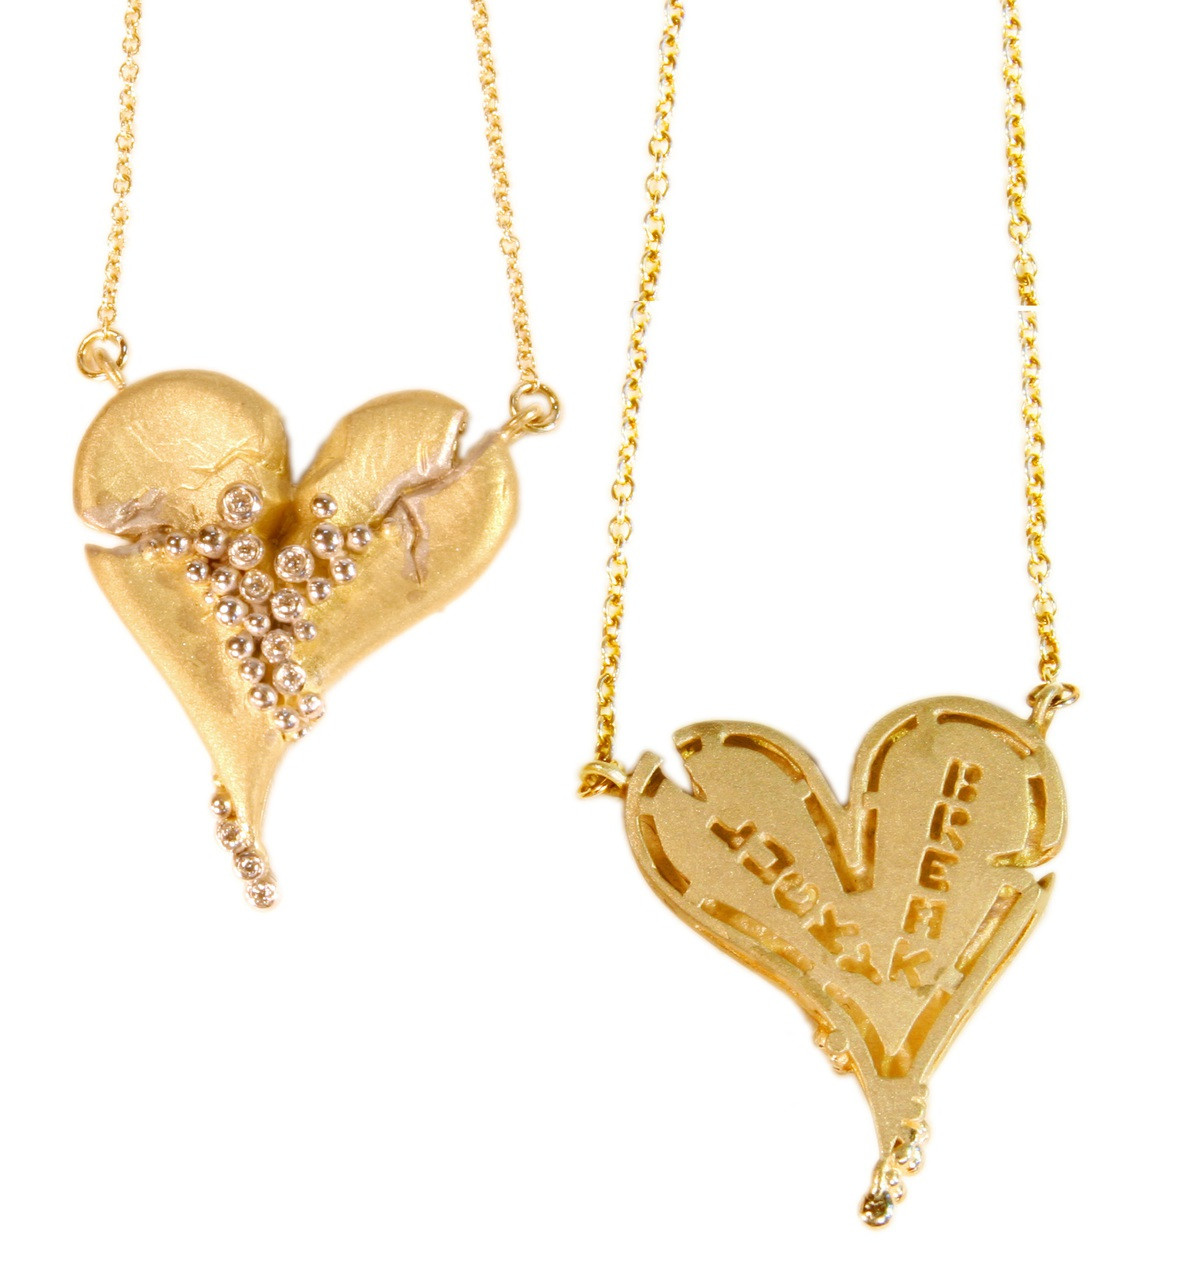 Hearts-Lucky Break Necklace-Medium-14K gold with diamonds